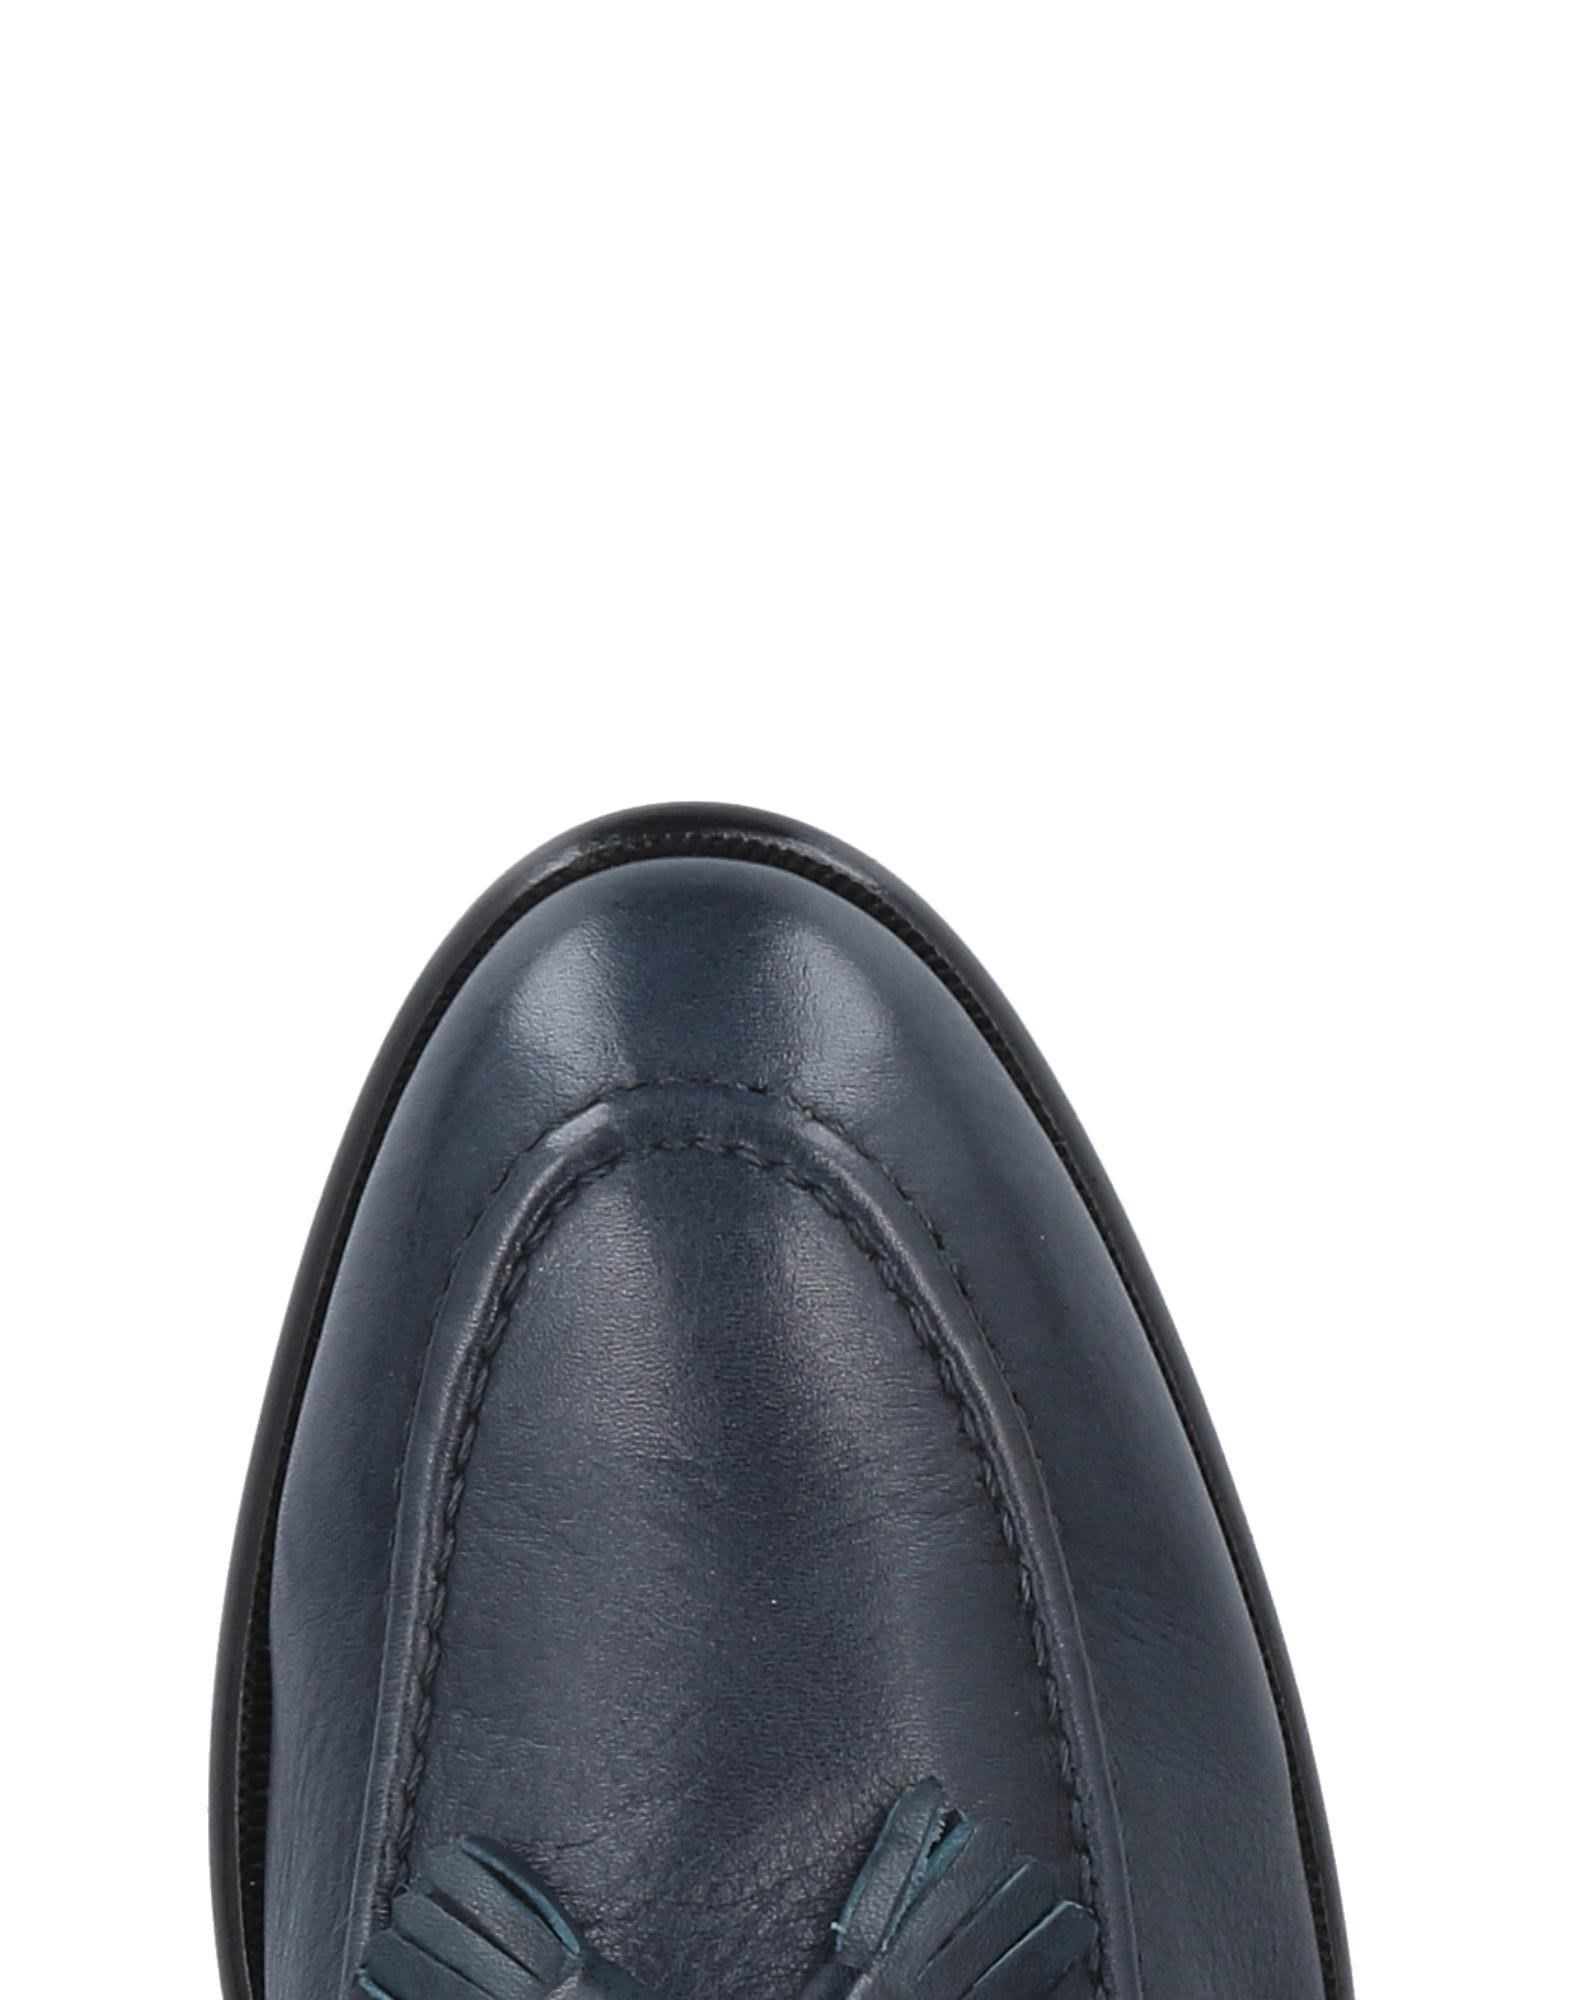 Botti 11461916KK Mokassins Herren  11461916KK Botti Gute Qualität beliebte Schuhe c3a6c3